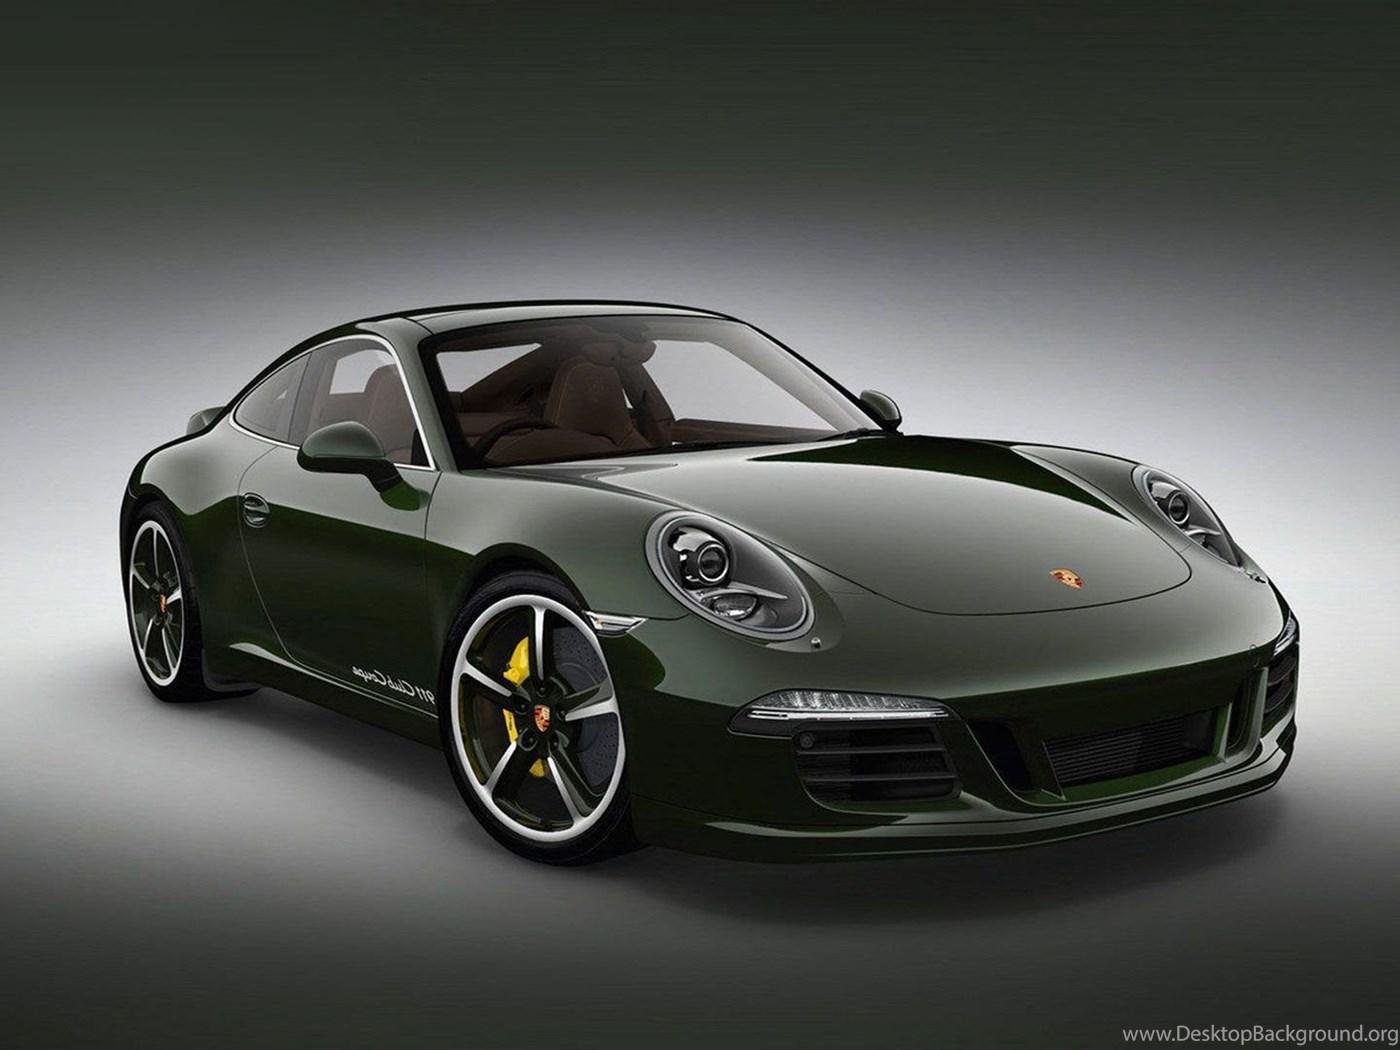 Porsche 911 Wallpaper Backgrounds Brute Cars Brute